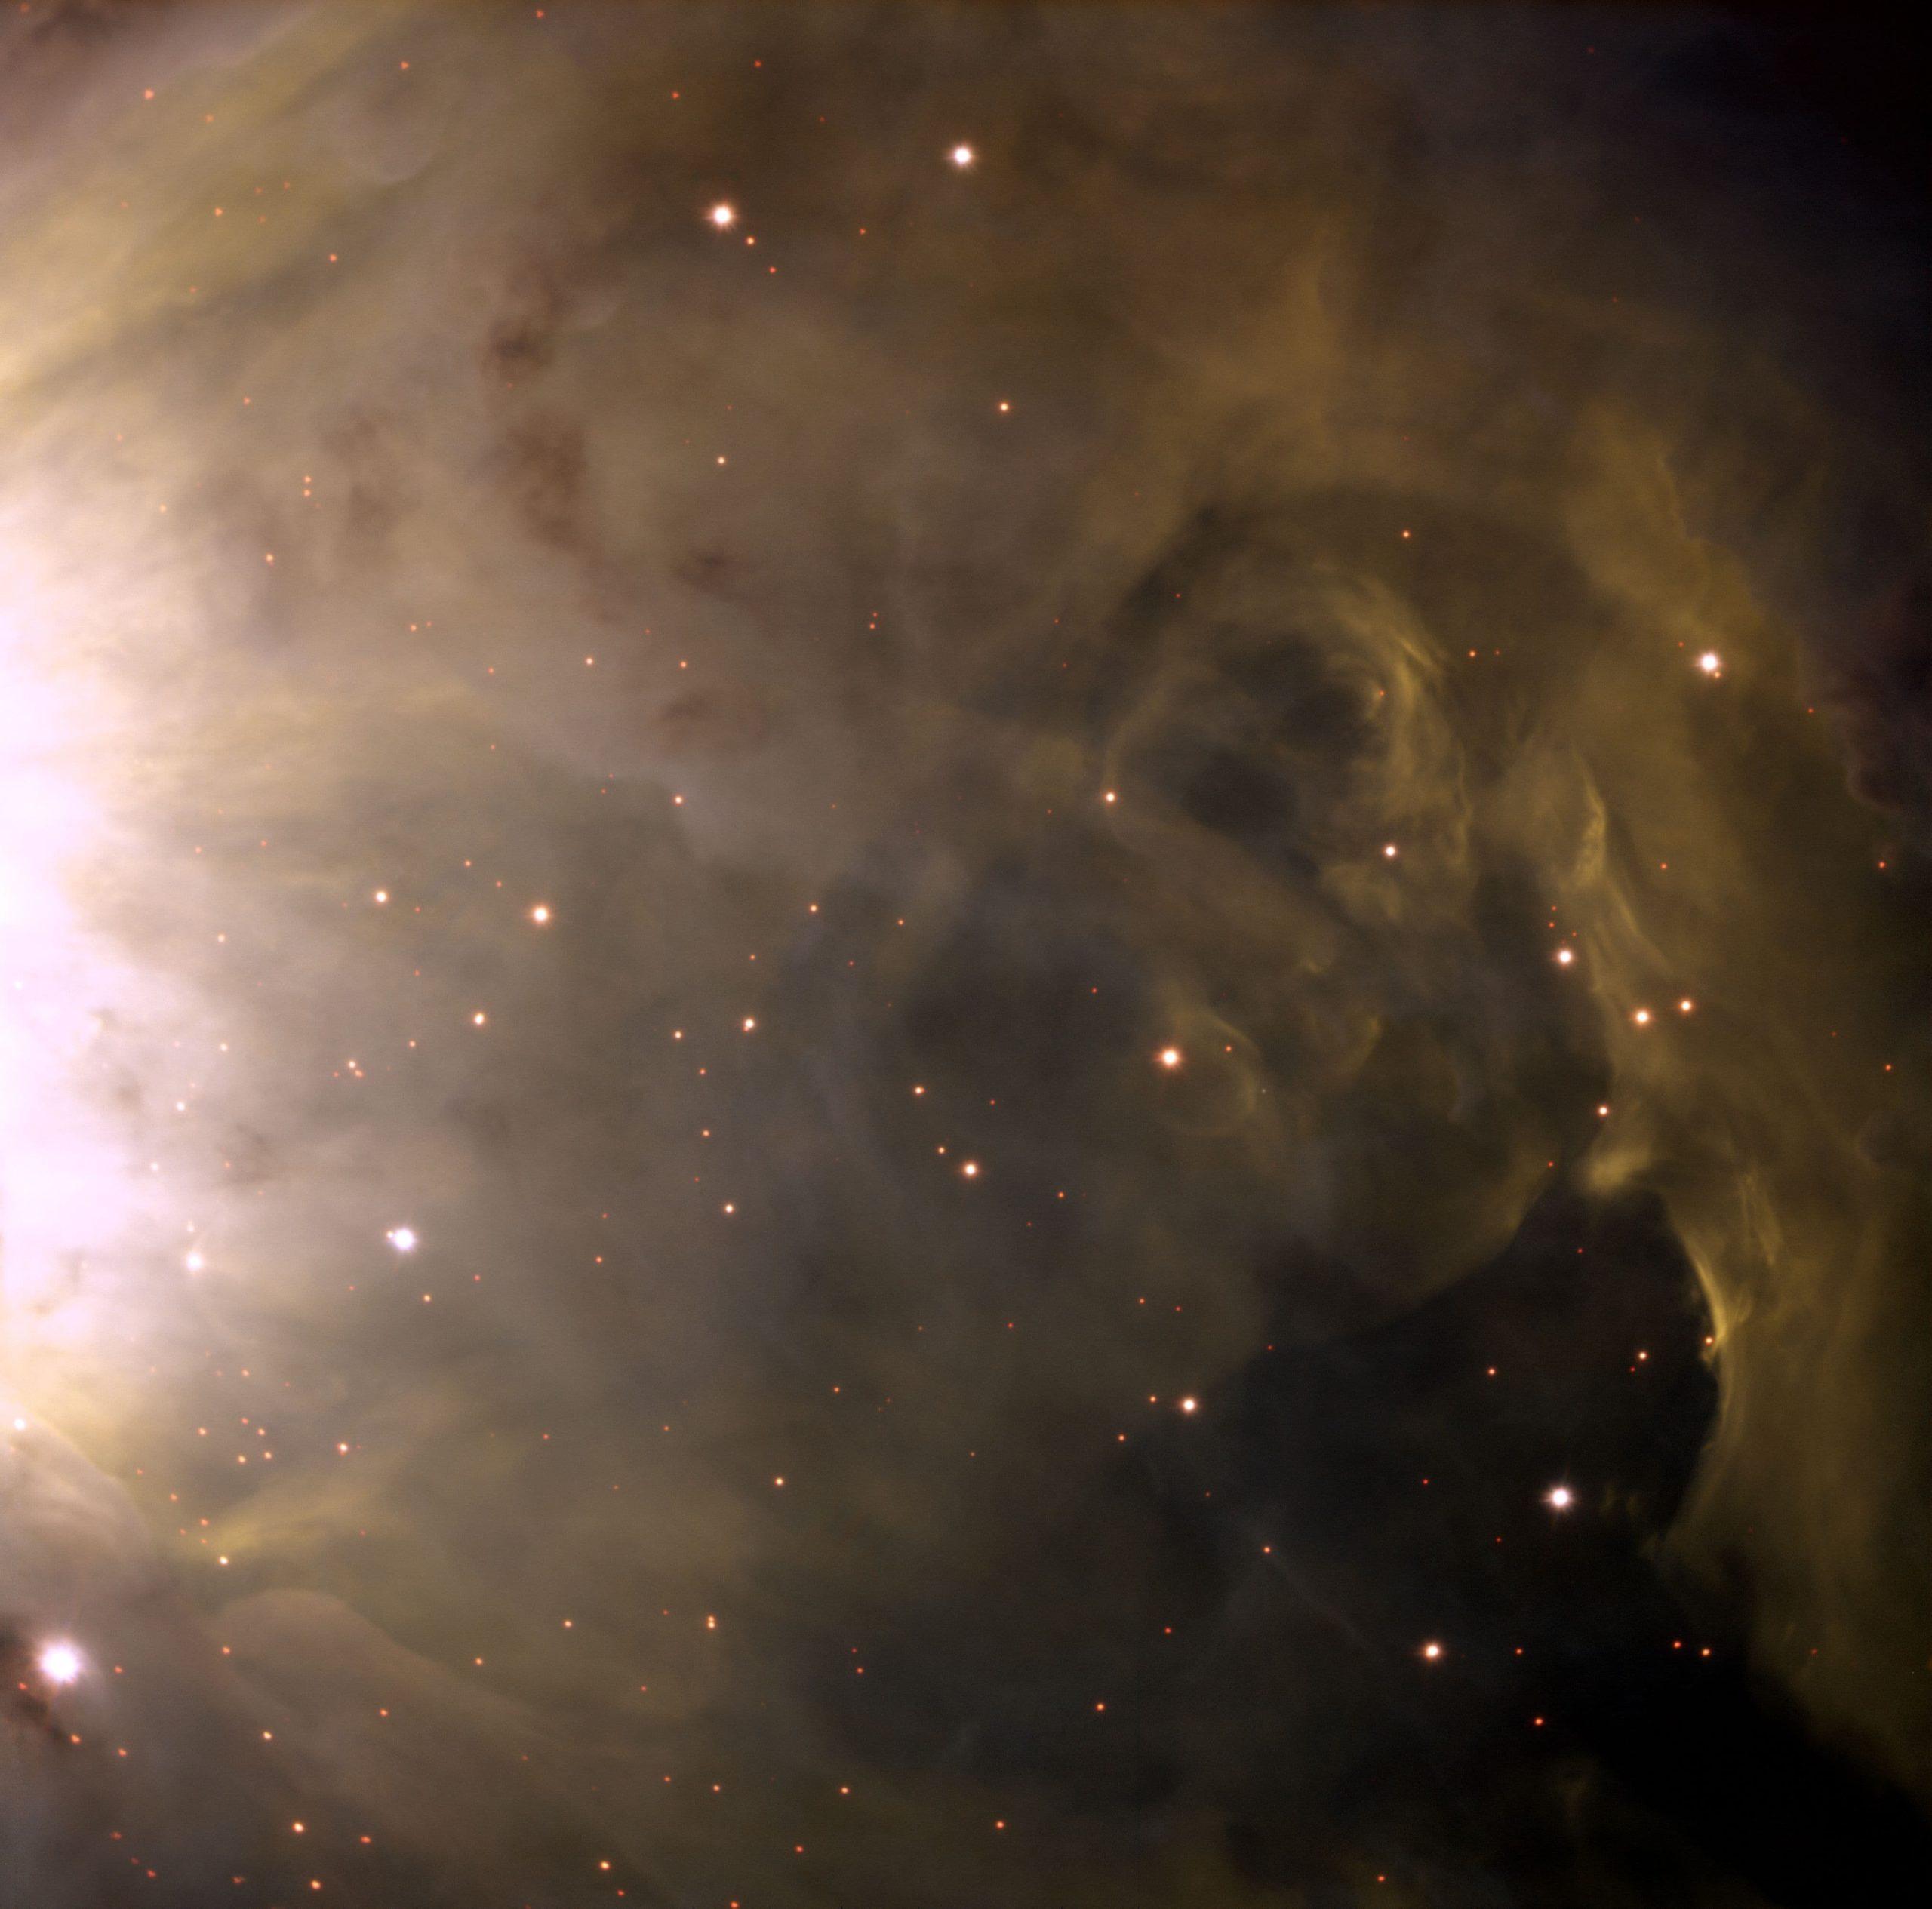 Detail of the Orion Nebula, an Emission Nebula, M42